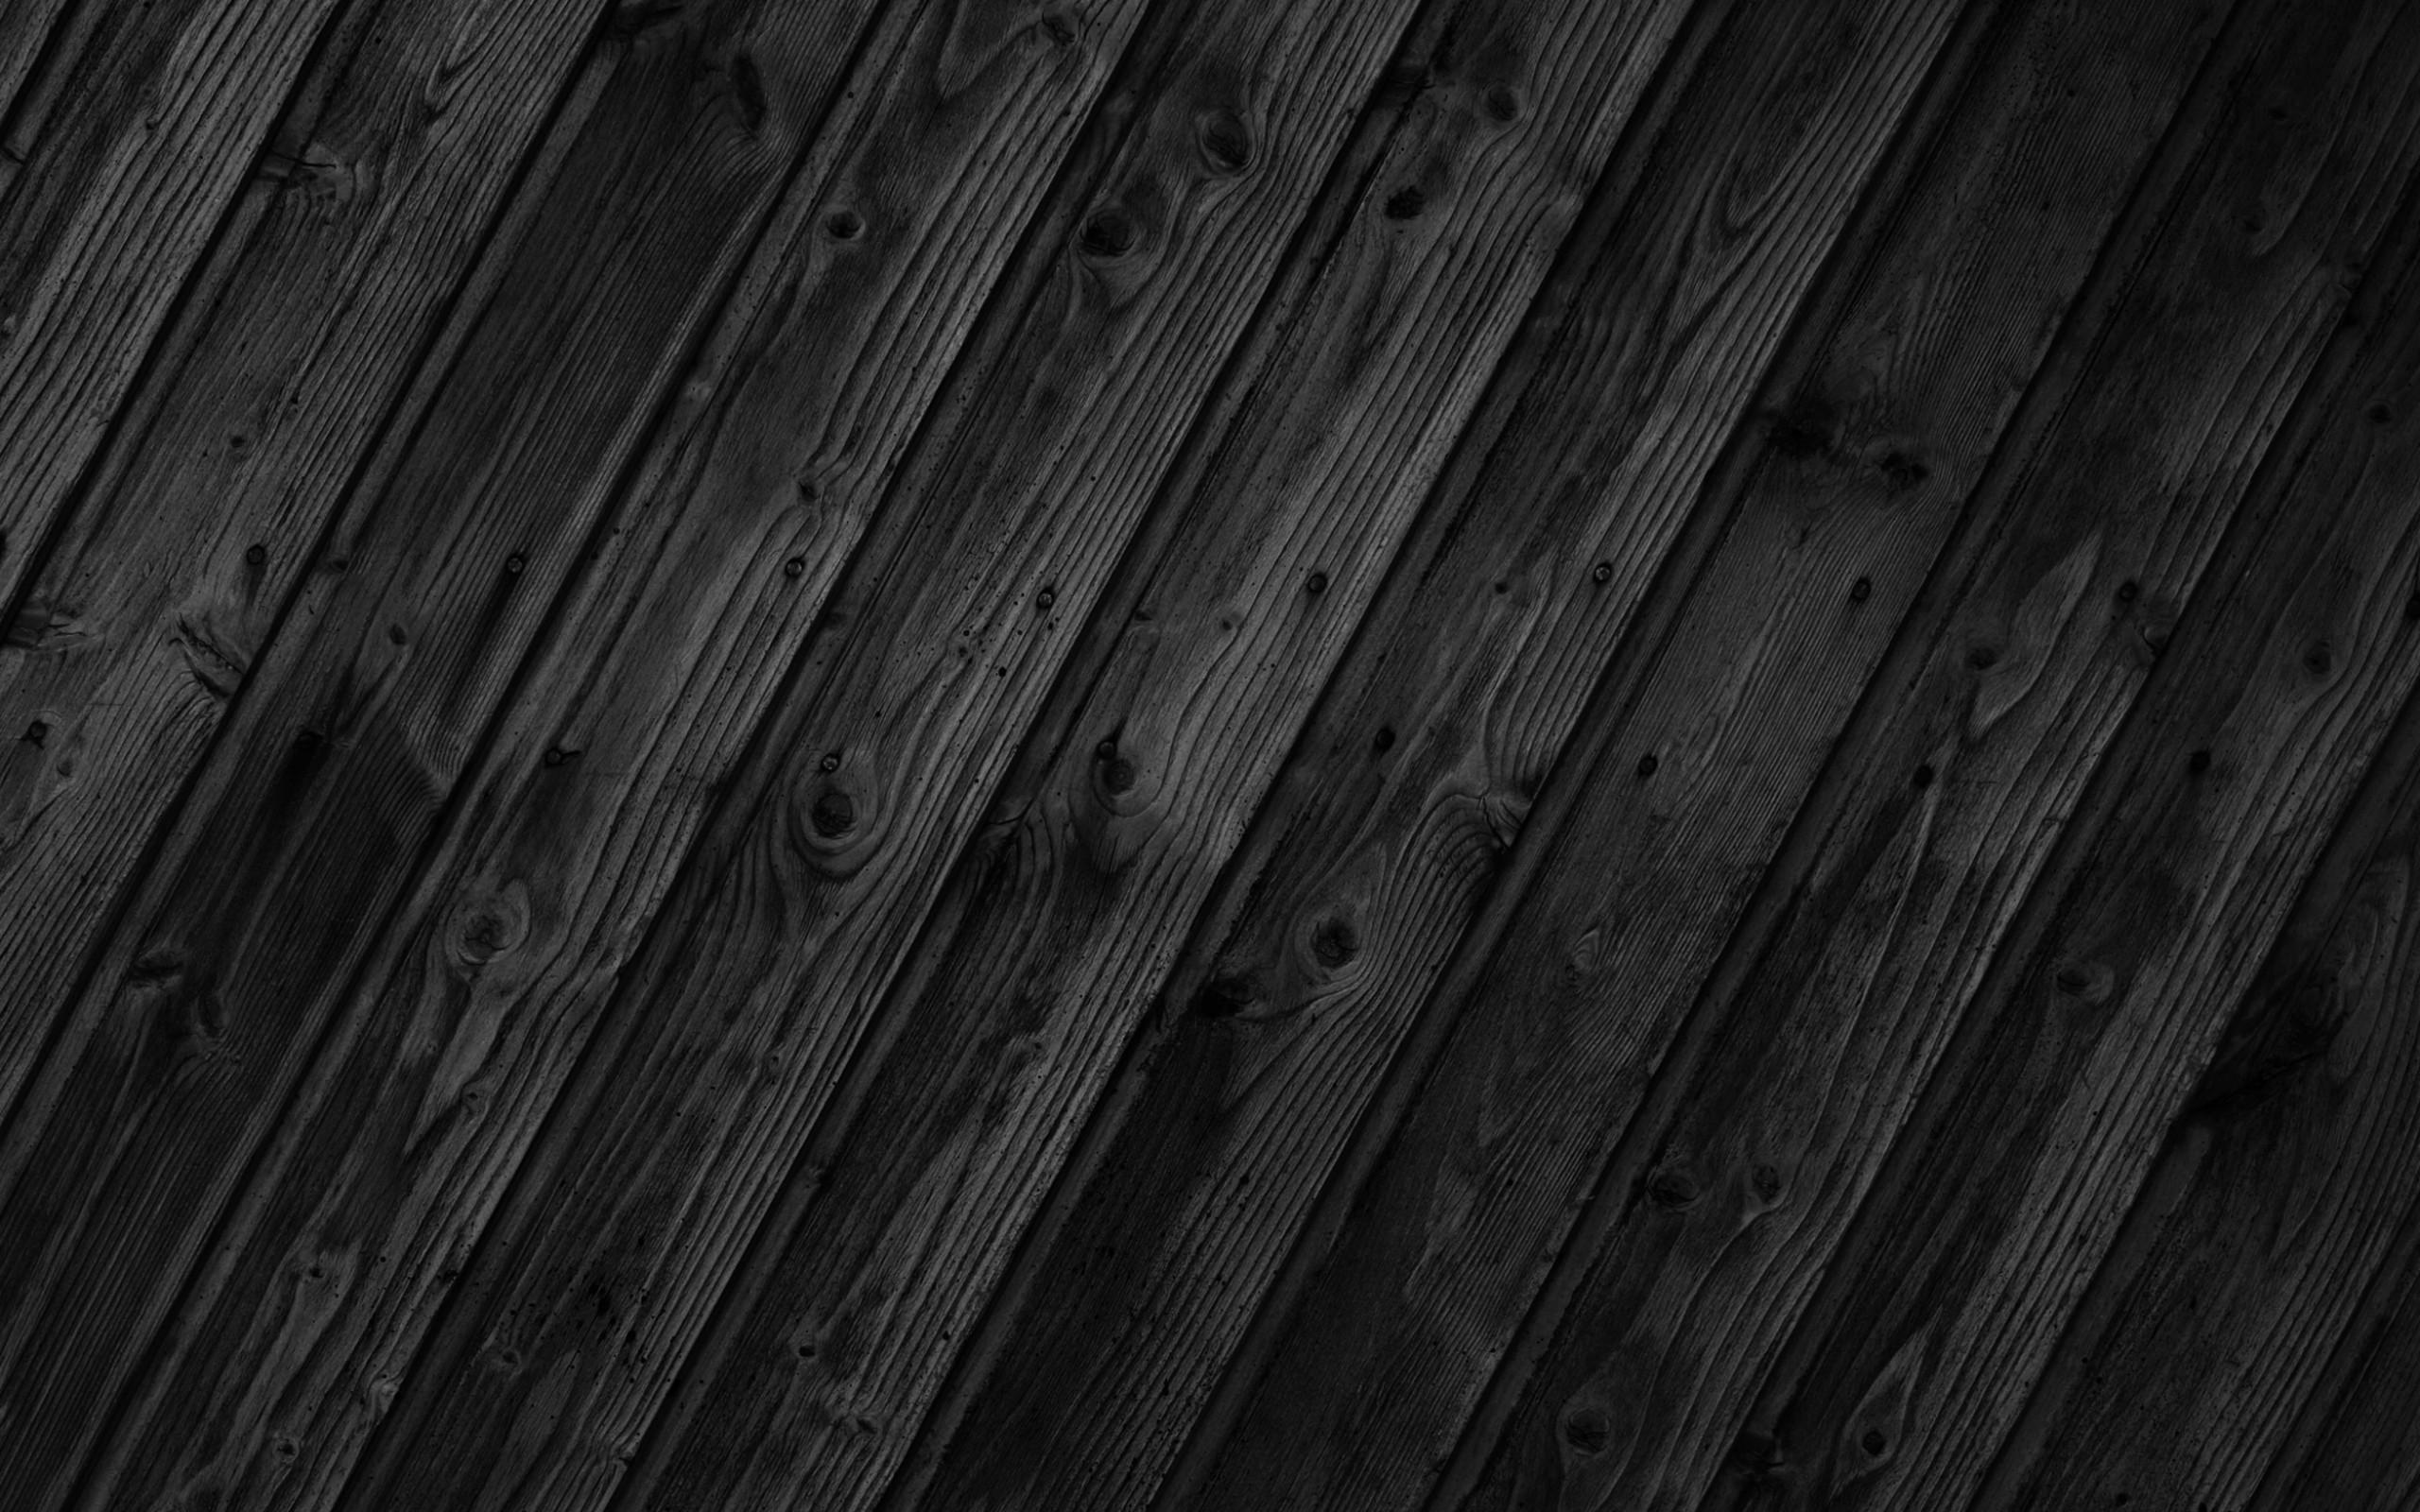 Stars Pattern Black And White Ipad Air Wallpaper Ilikewallpaper Com